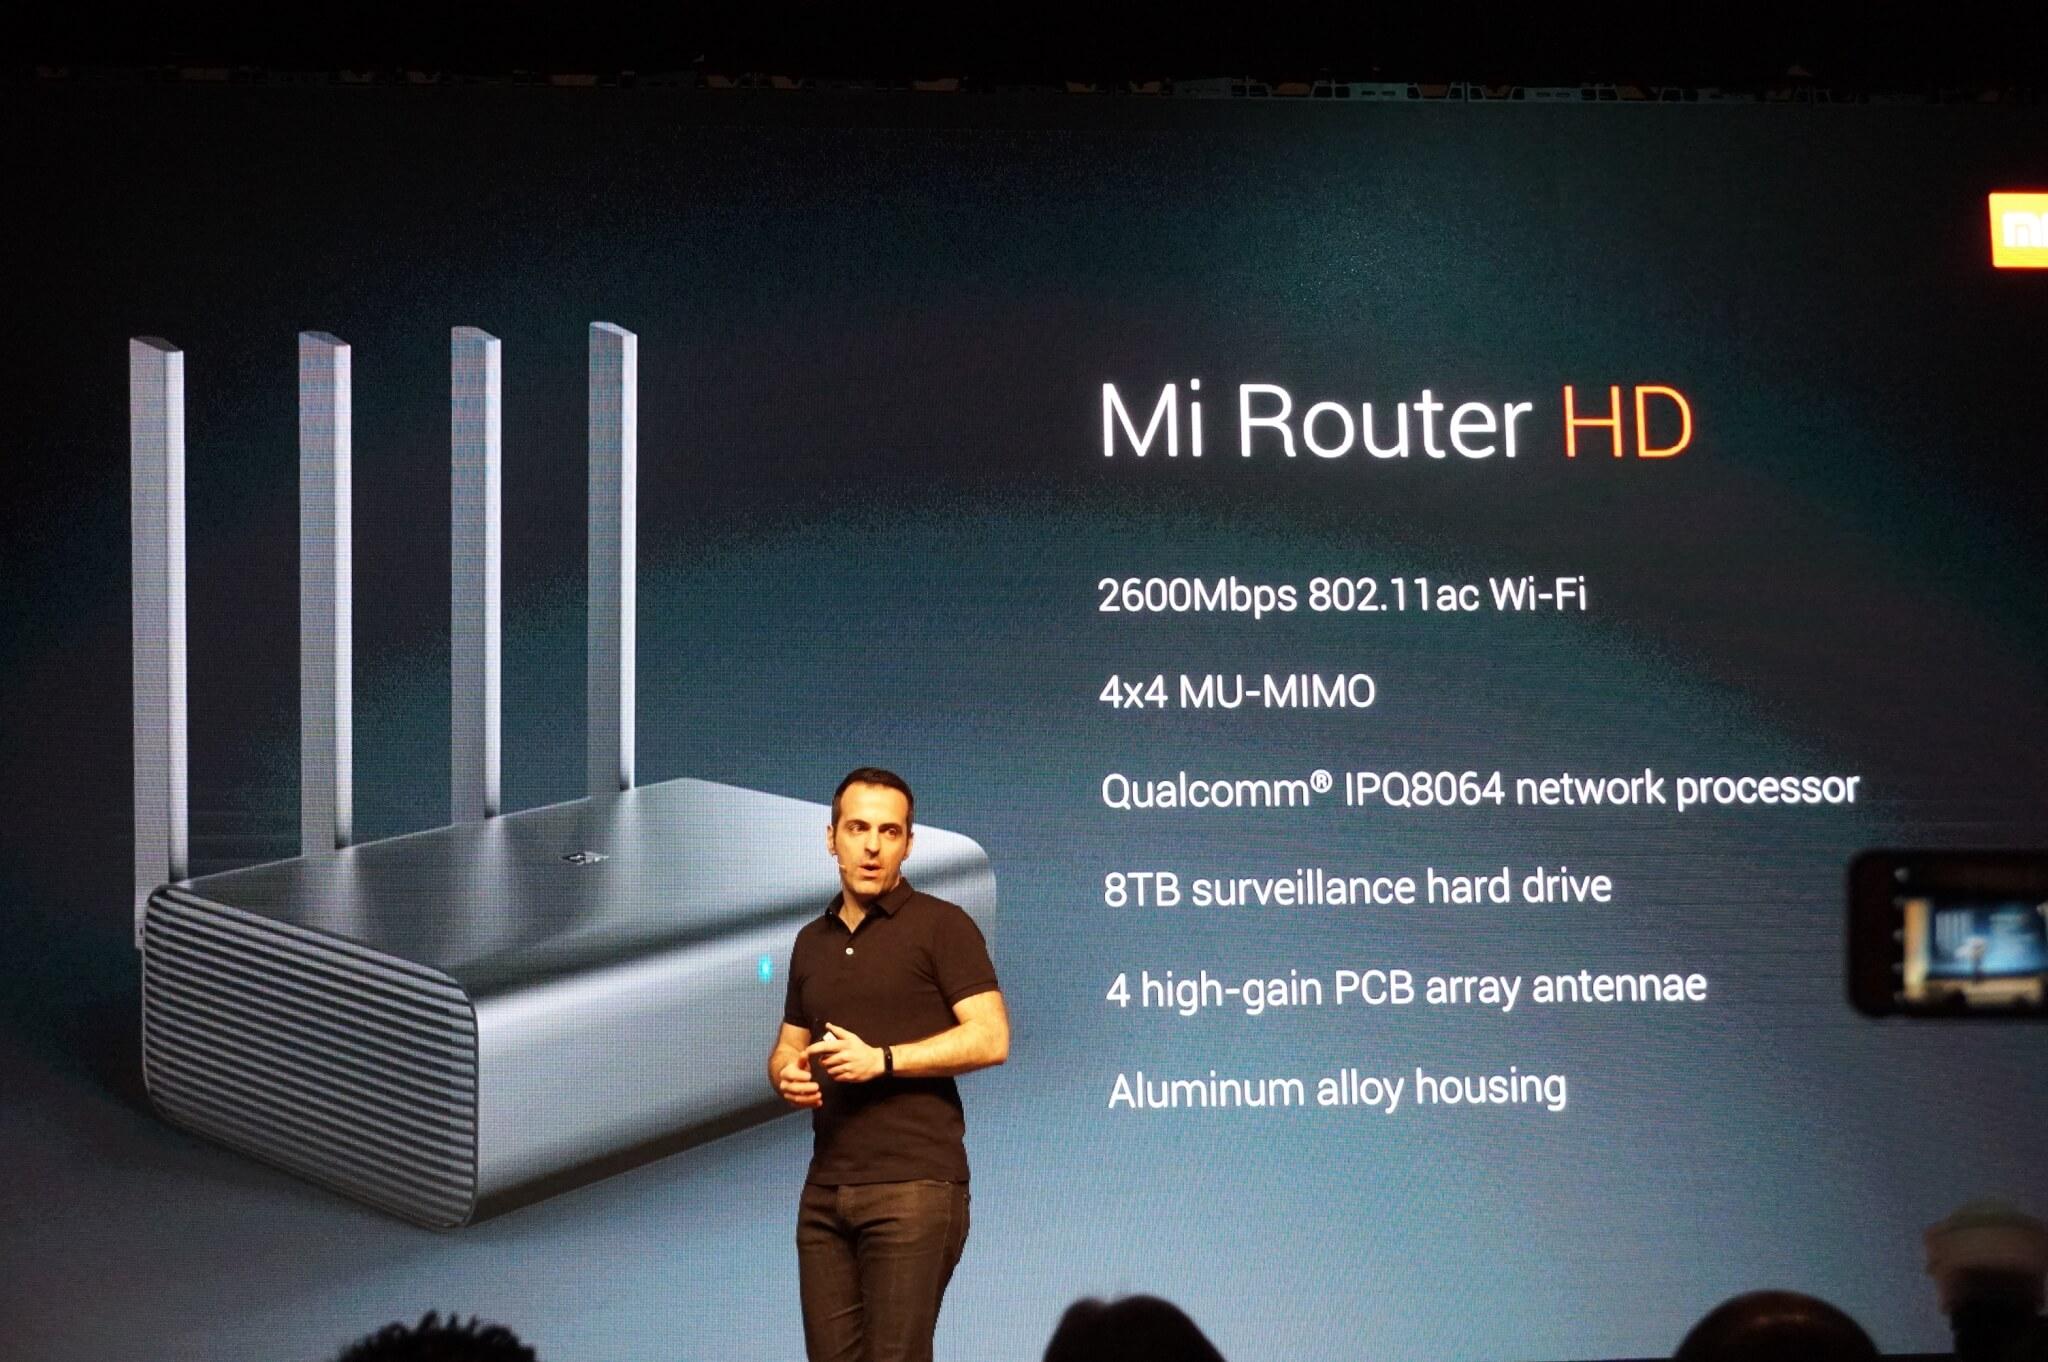 Xiaomi's Hugo Barra introduces the Mi Router HD.